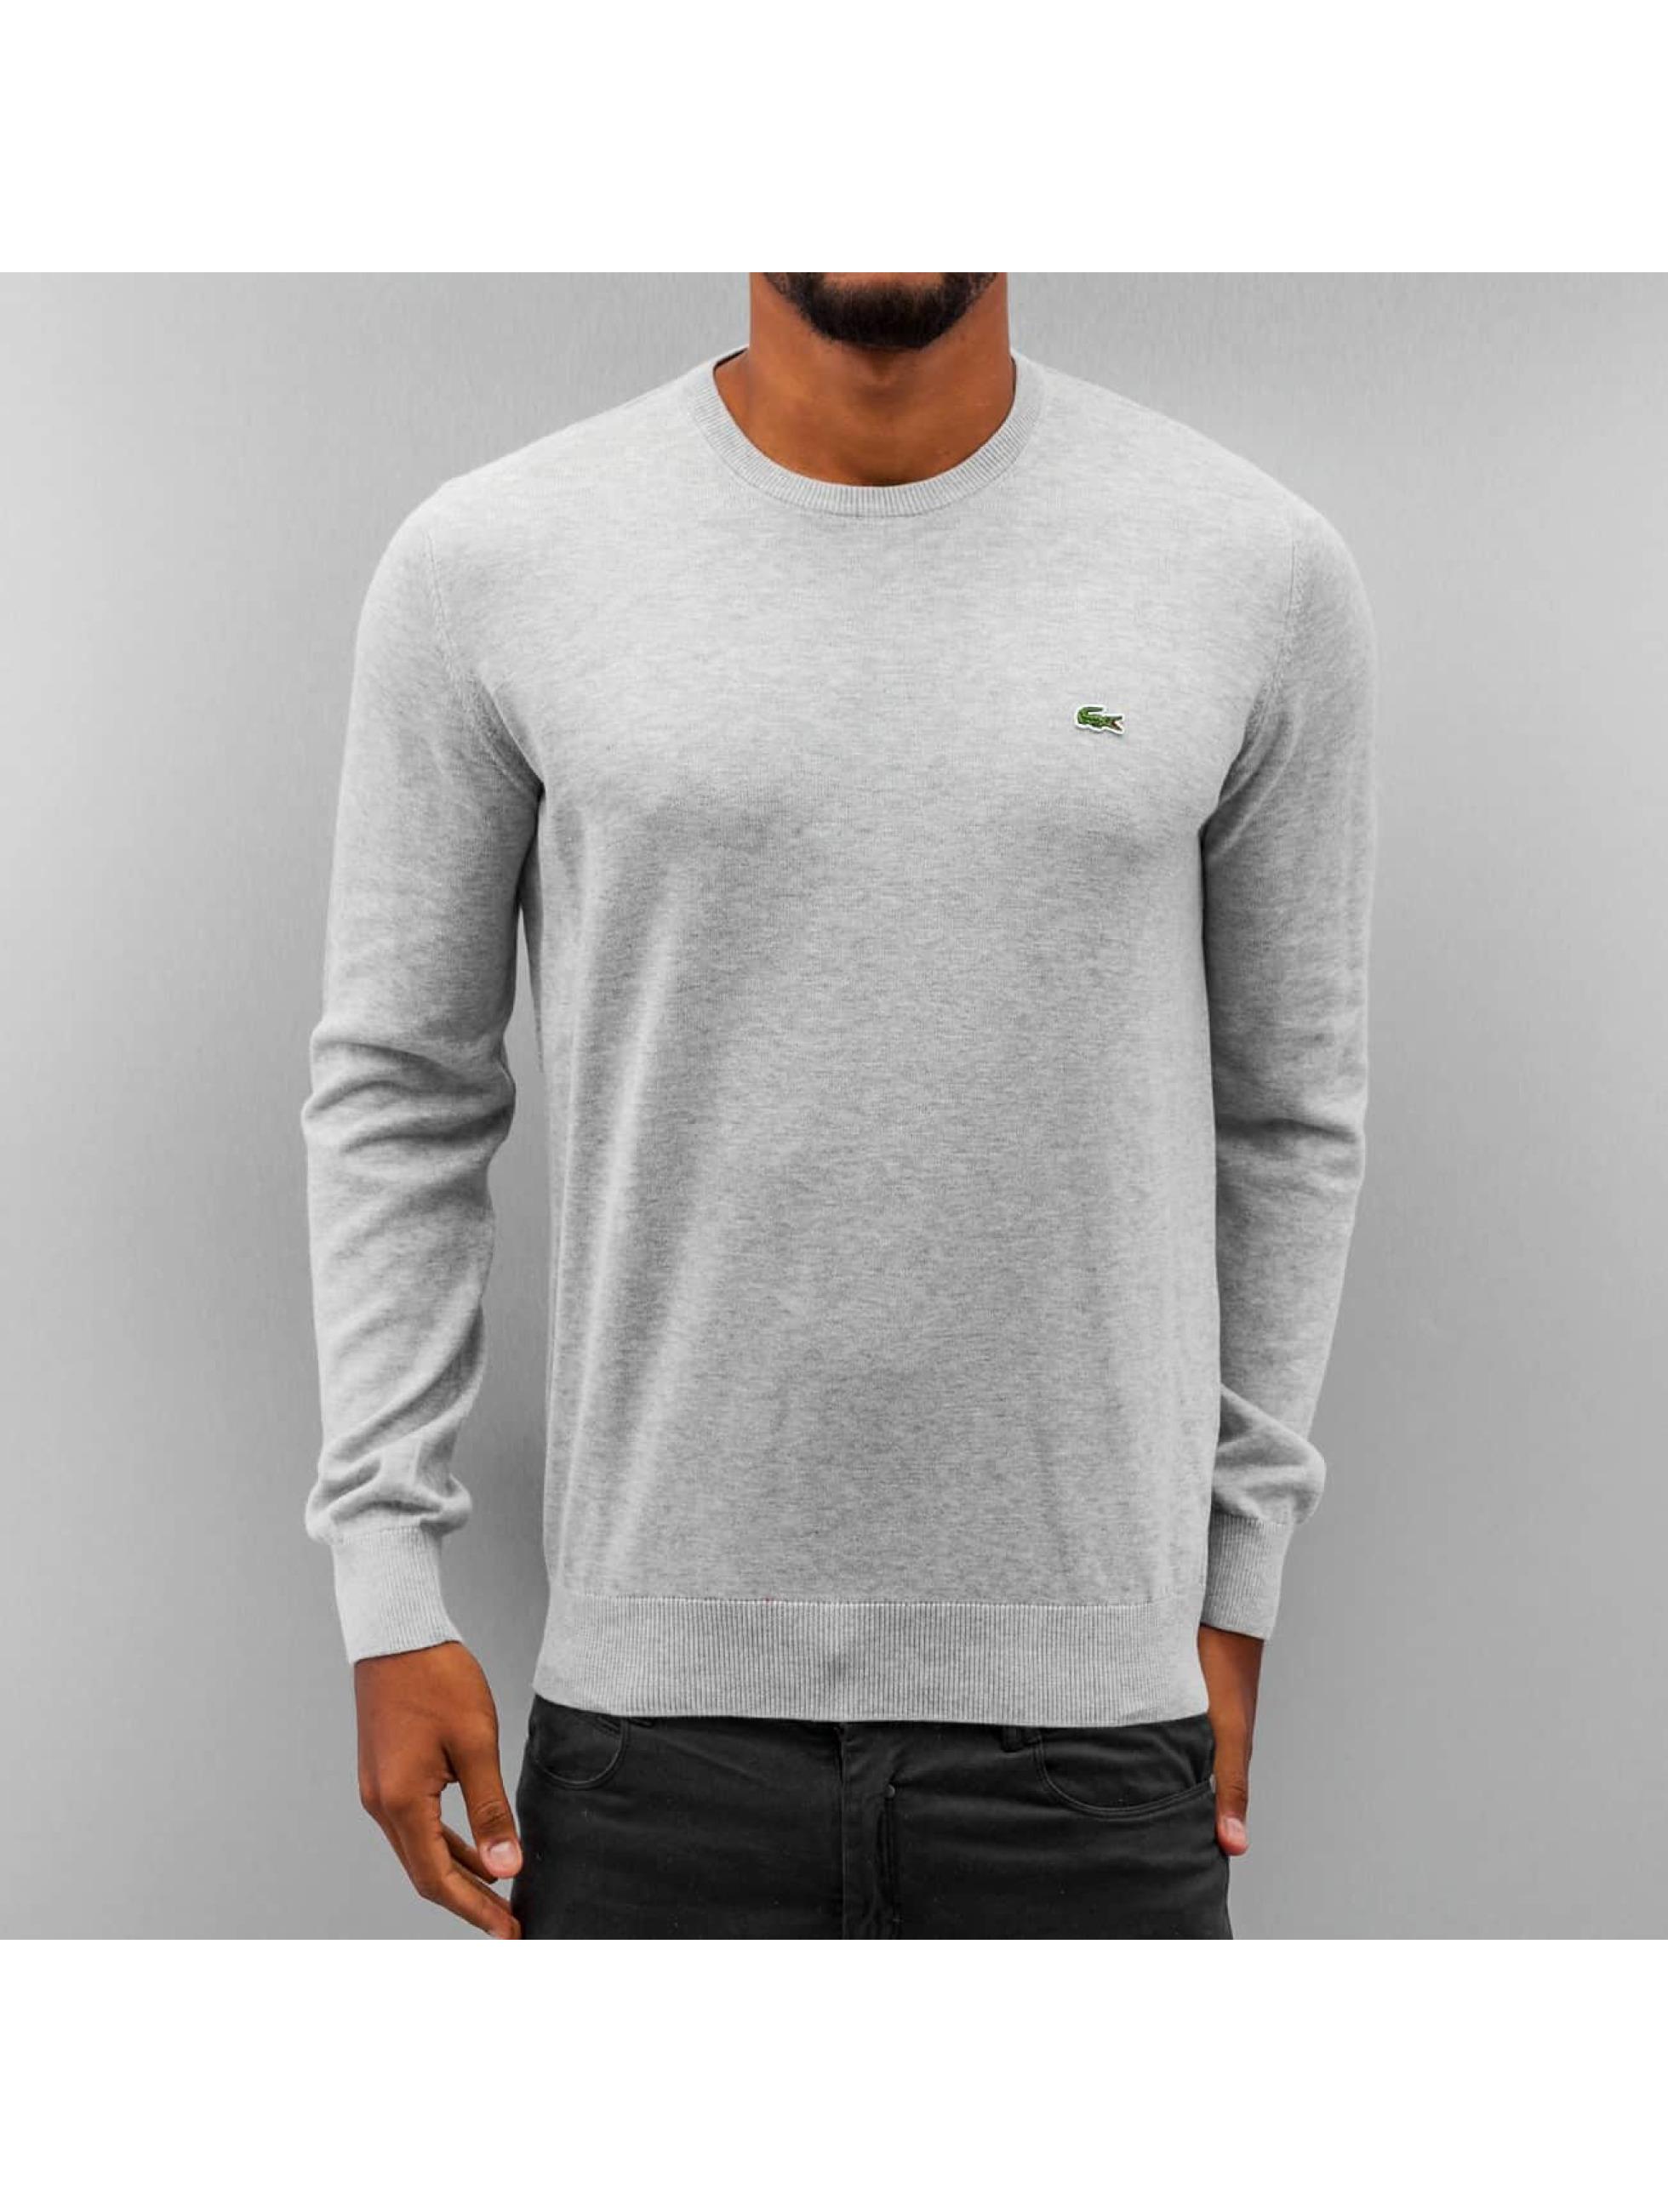 Superdry t-shirt größe